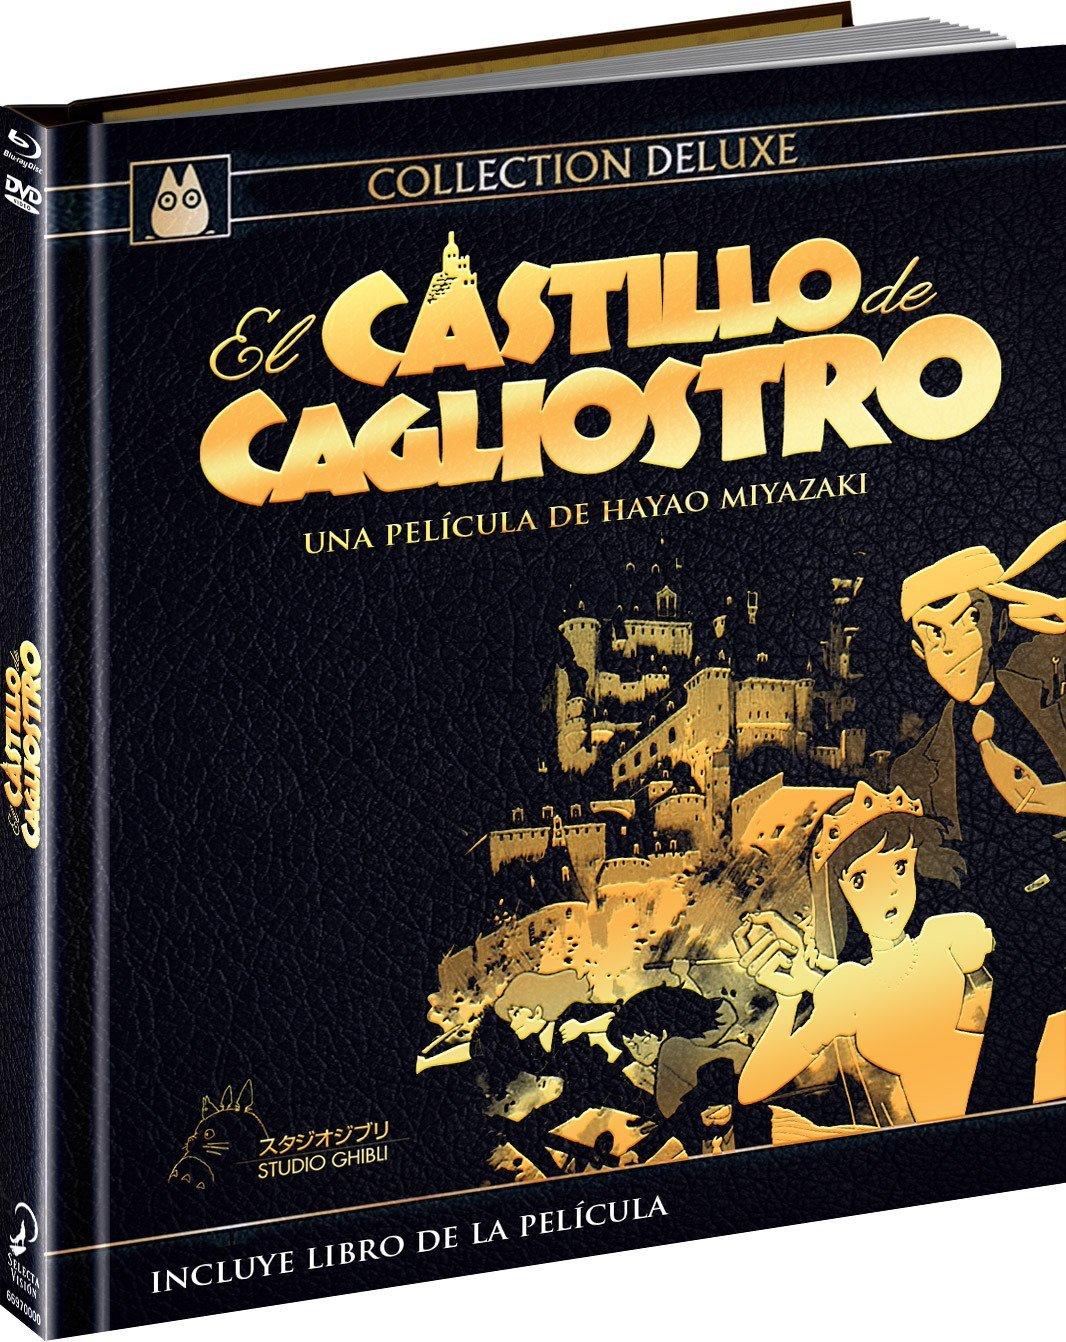 Lupin El Castillo de Cagliostro Combo BD DVD Digibook